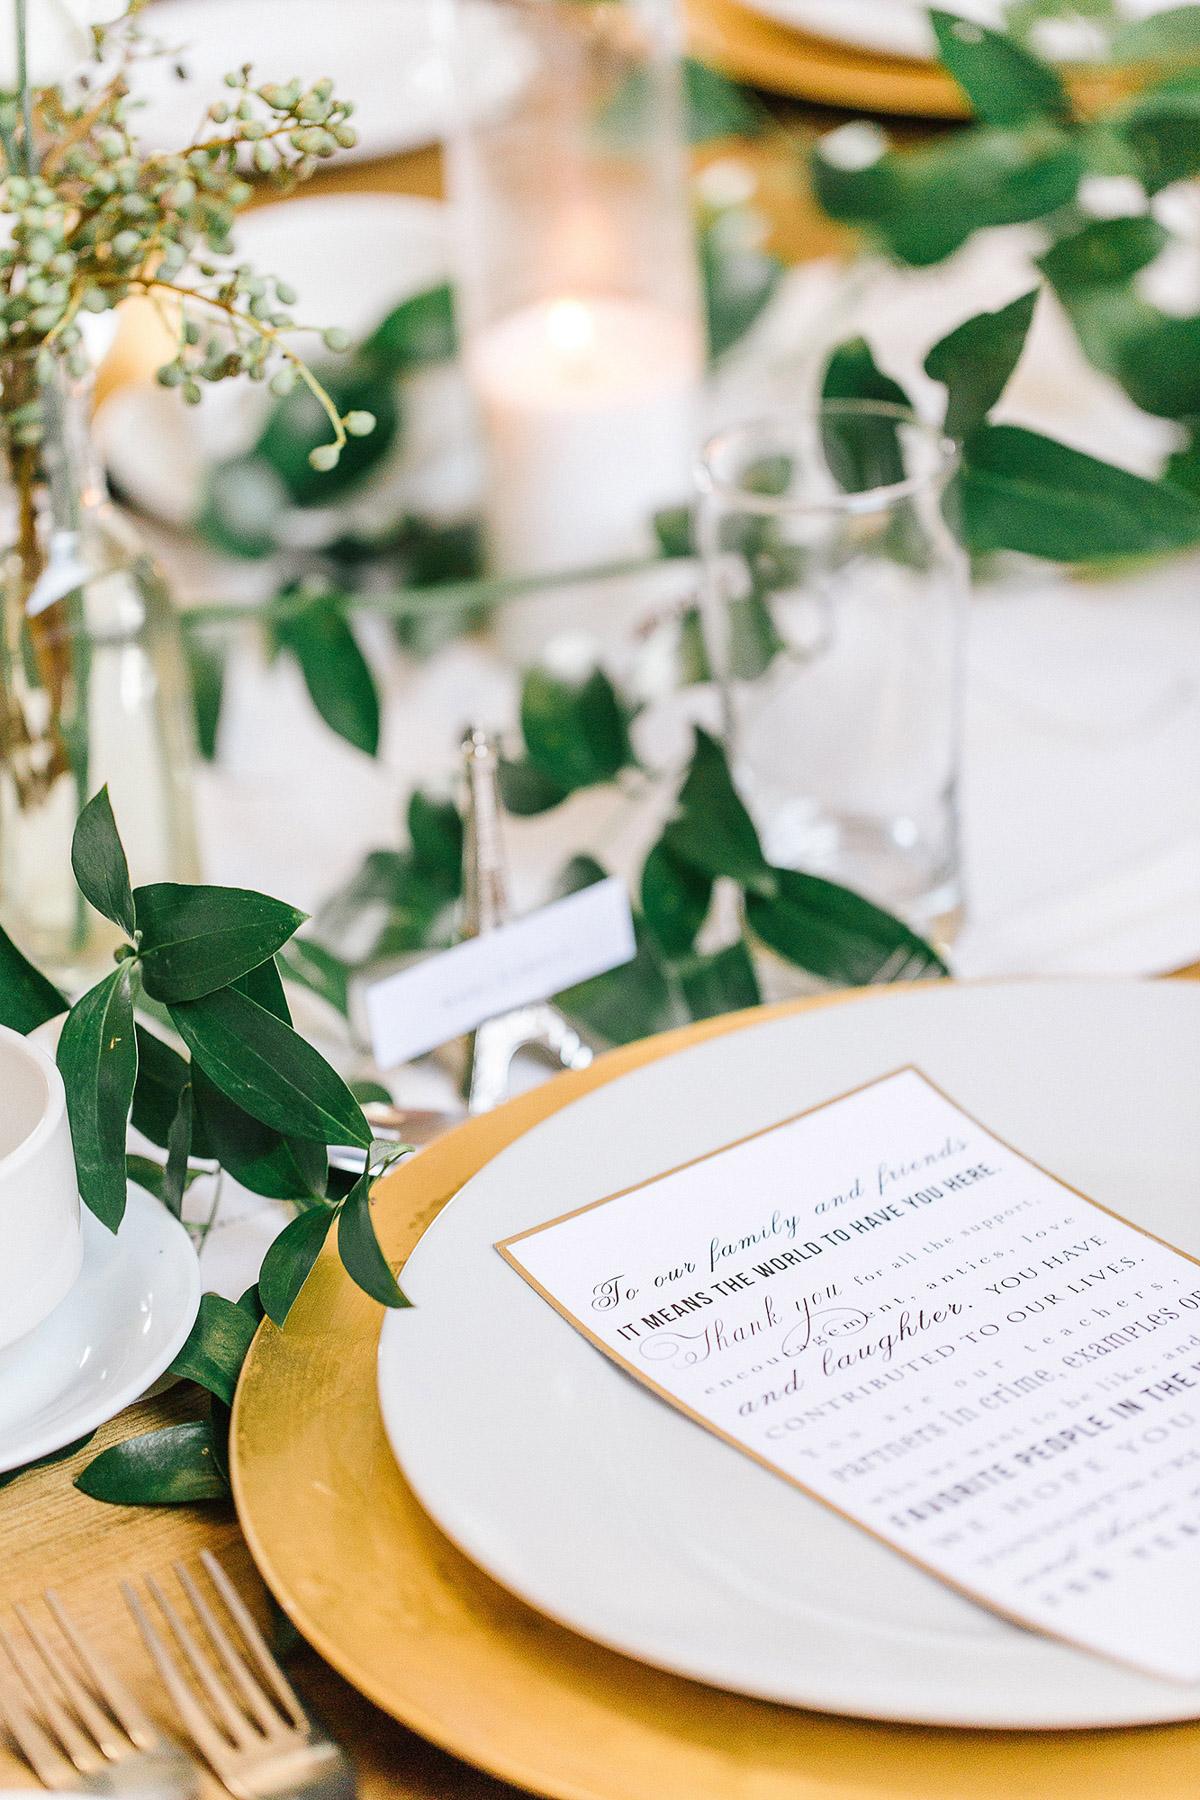 tamara-lockwood-photography-vineyard-bride-swish-list-the-old-courthouse-niagara-on-the-lake-wedding-63.jpg